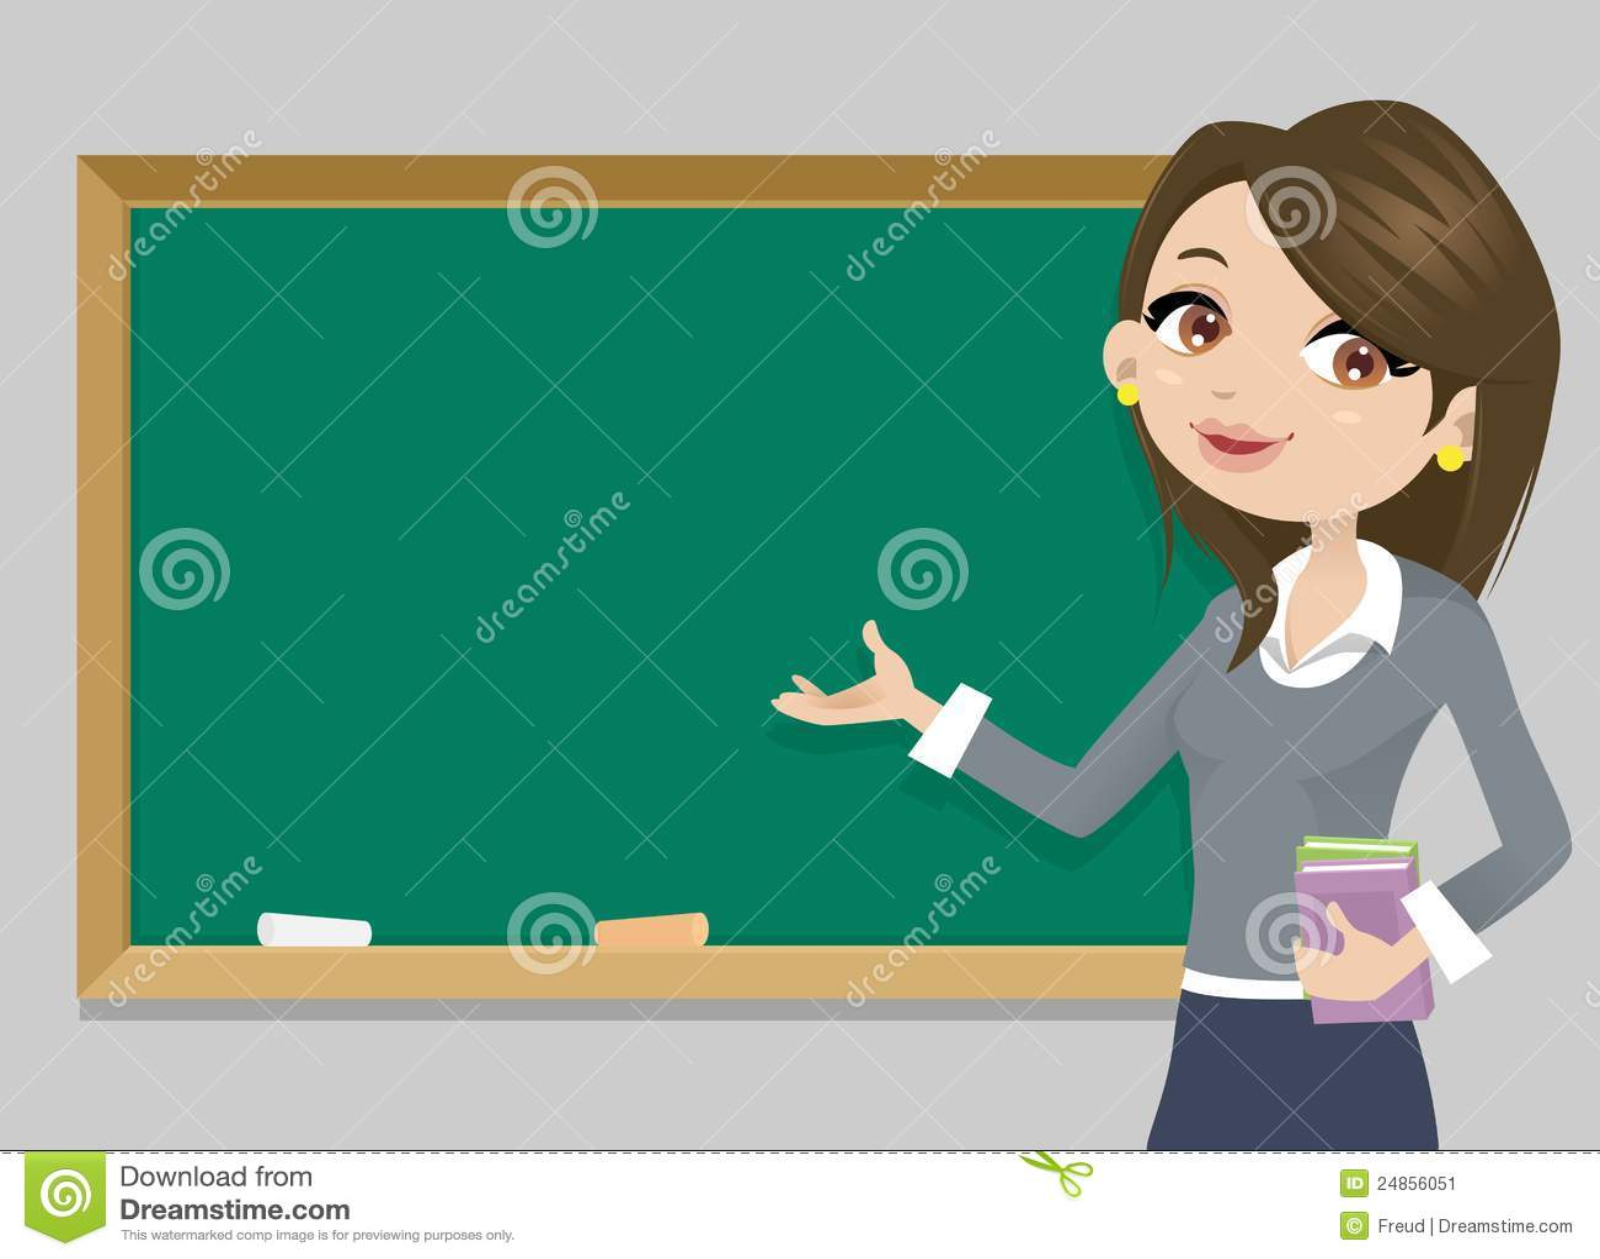 download Adobe Photoshop CS5 Classroom